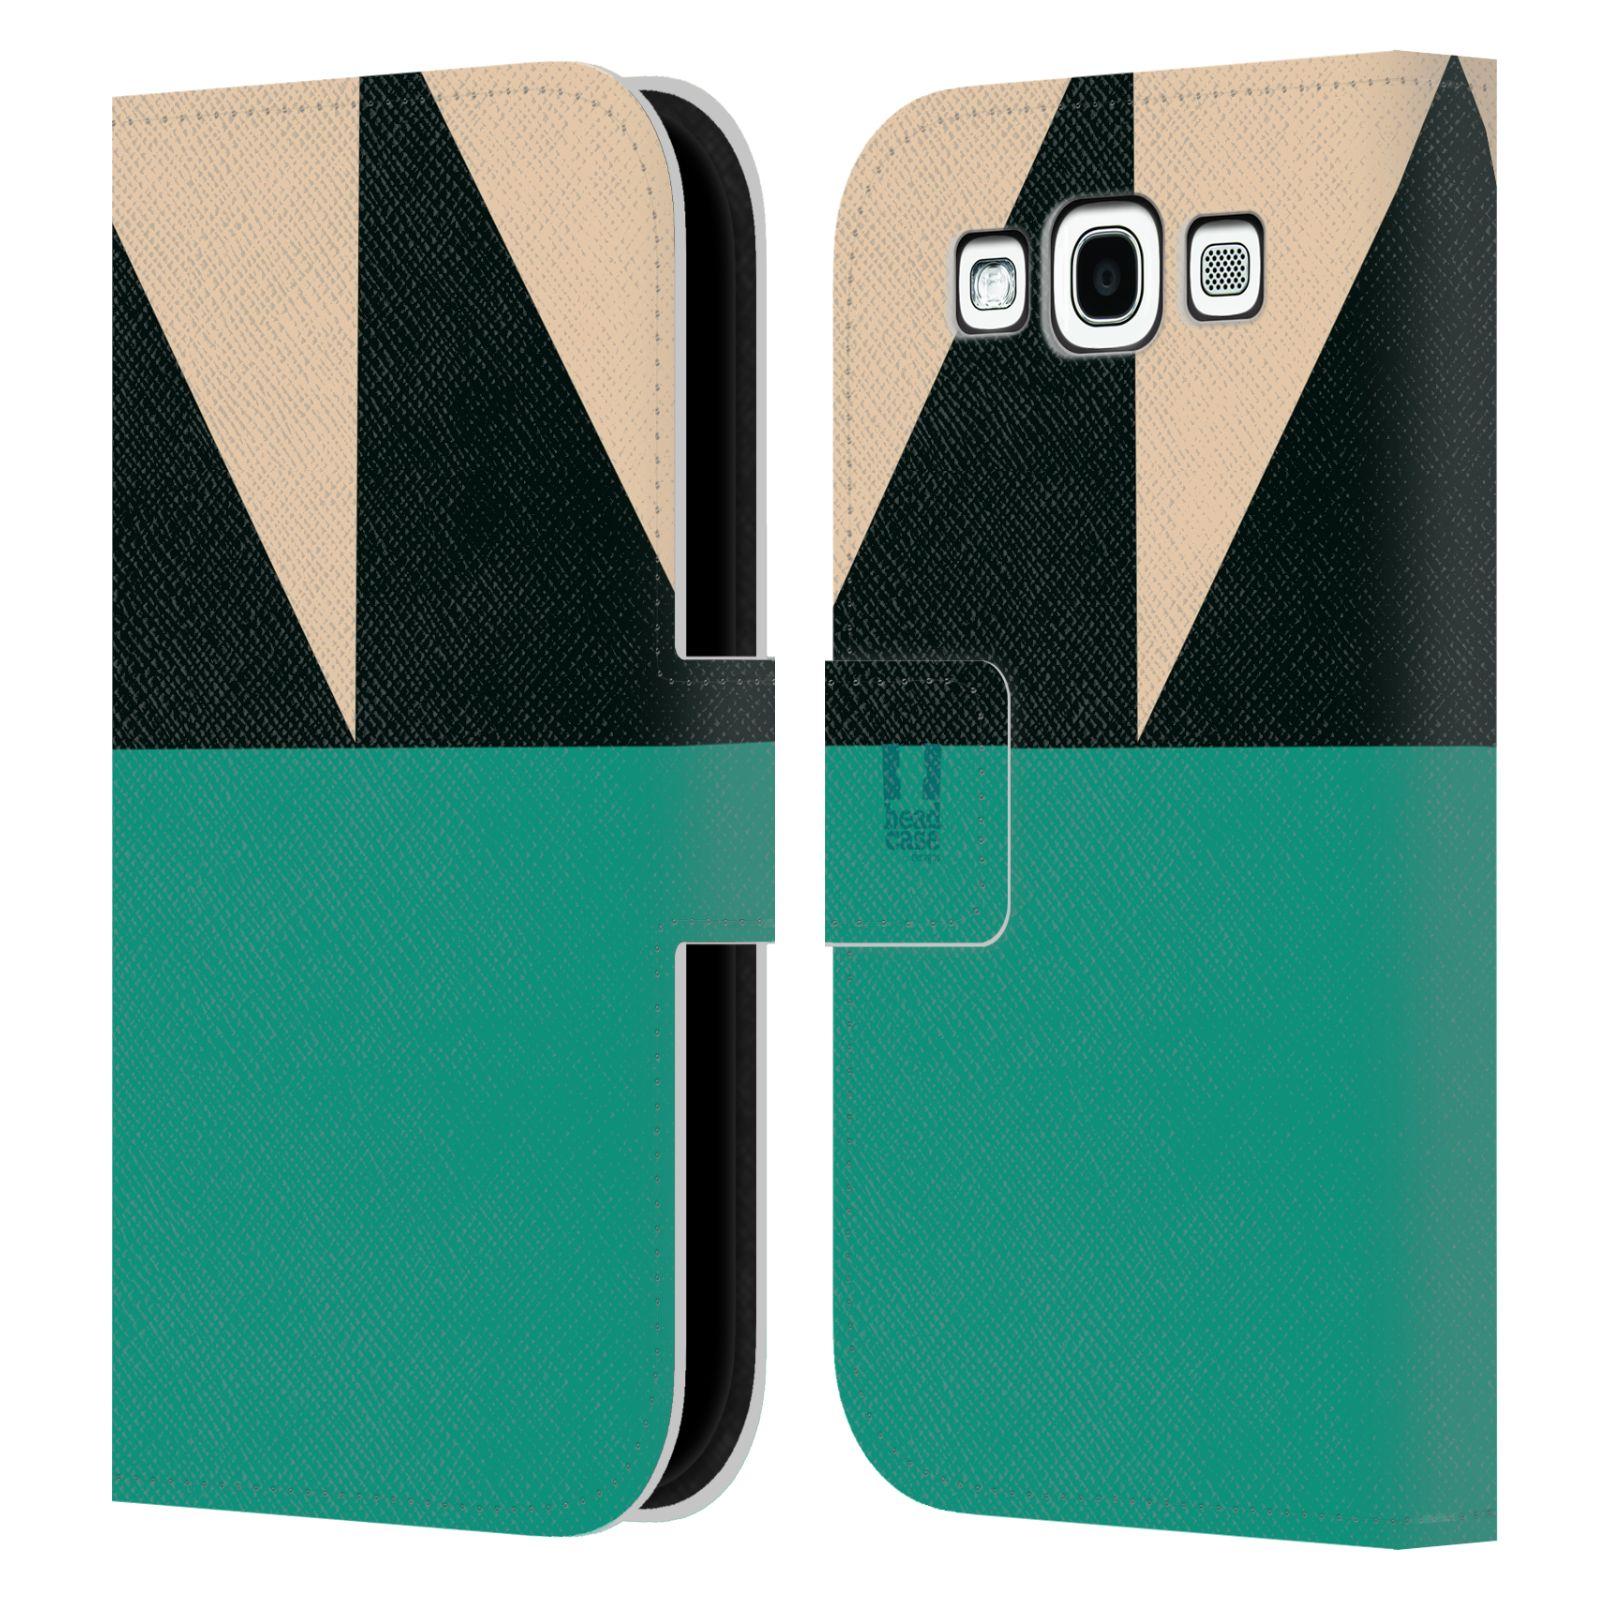 HEAD CASE Flipové pouzdro pro mobil Samsung Galaxy S3 I9300 barevné tvary moře modrá